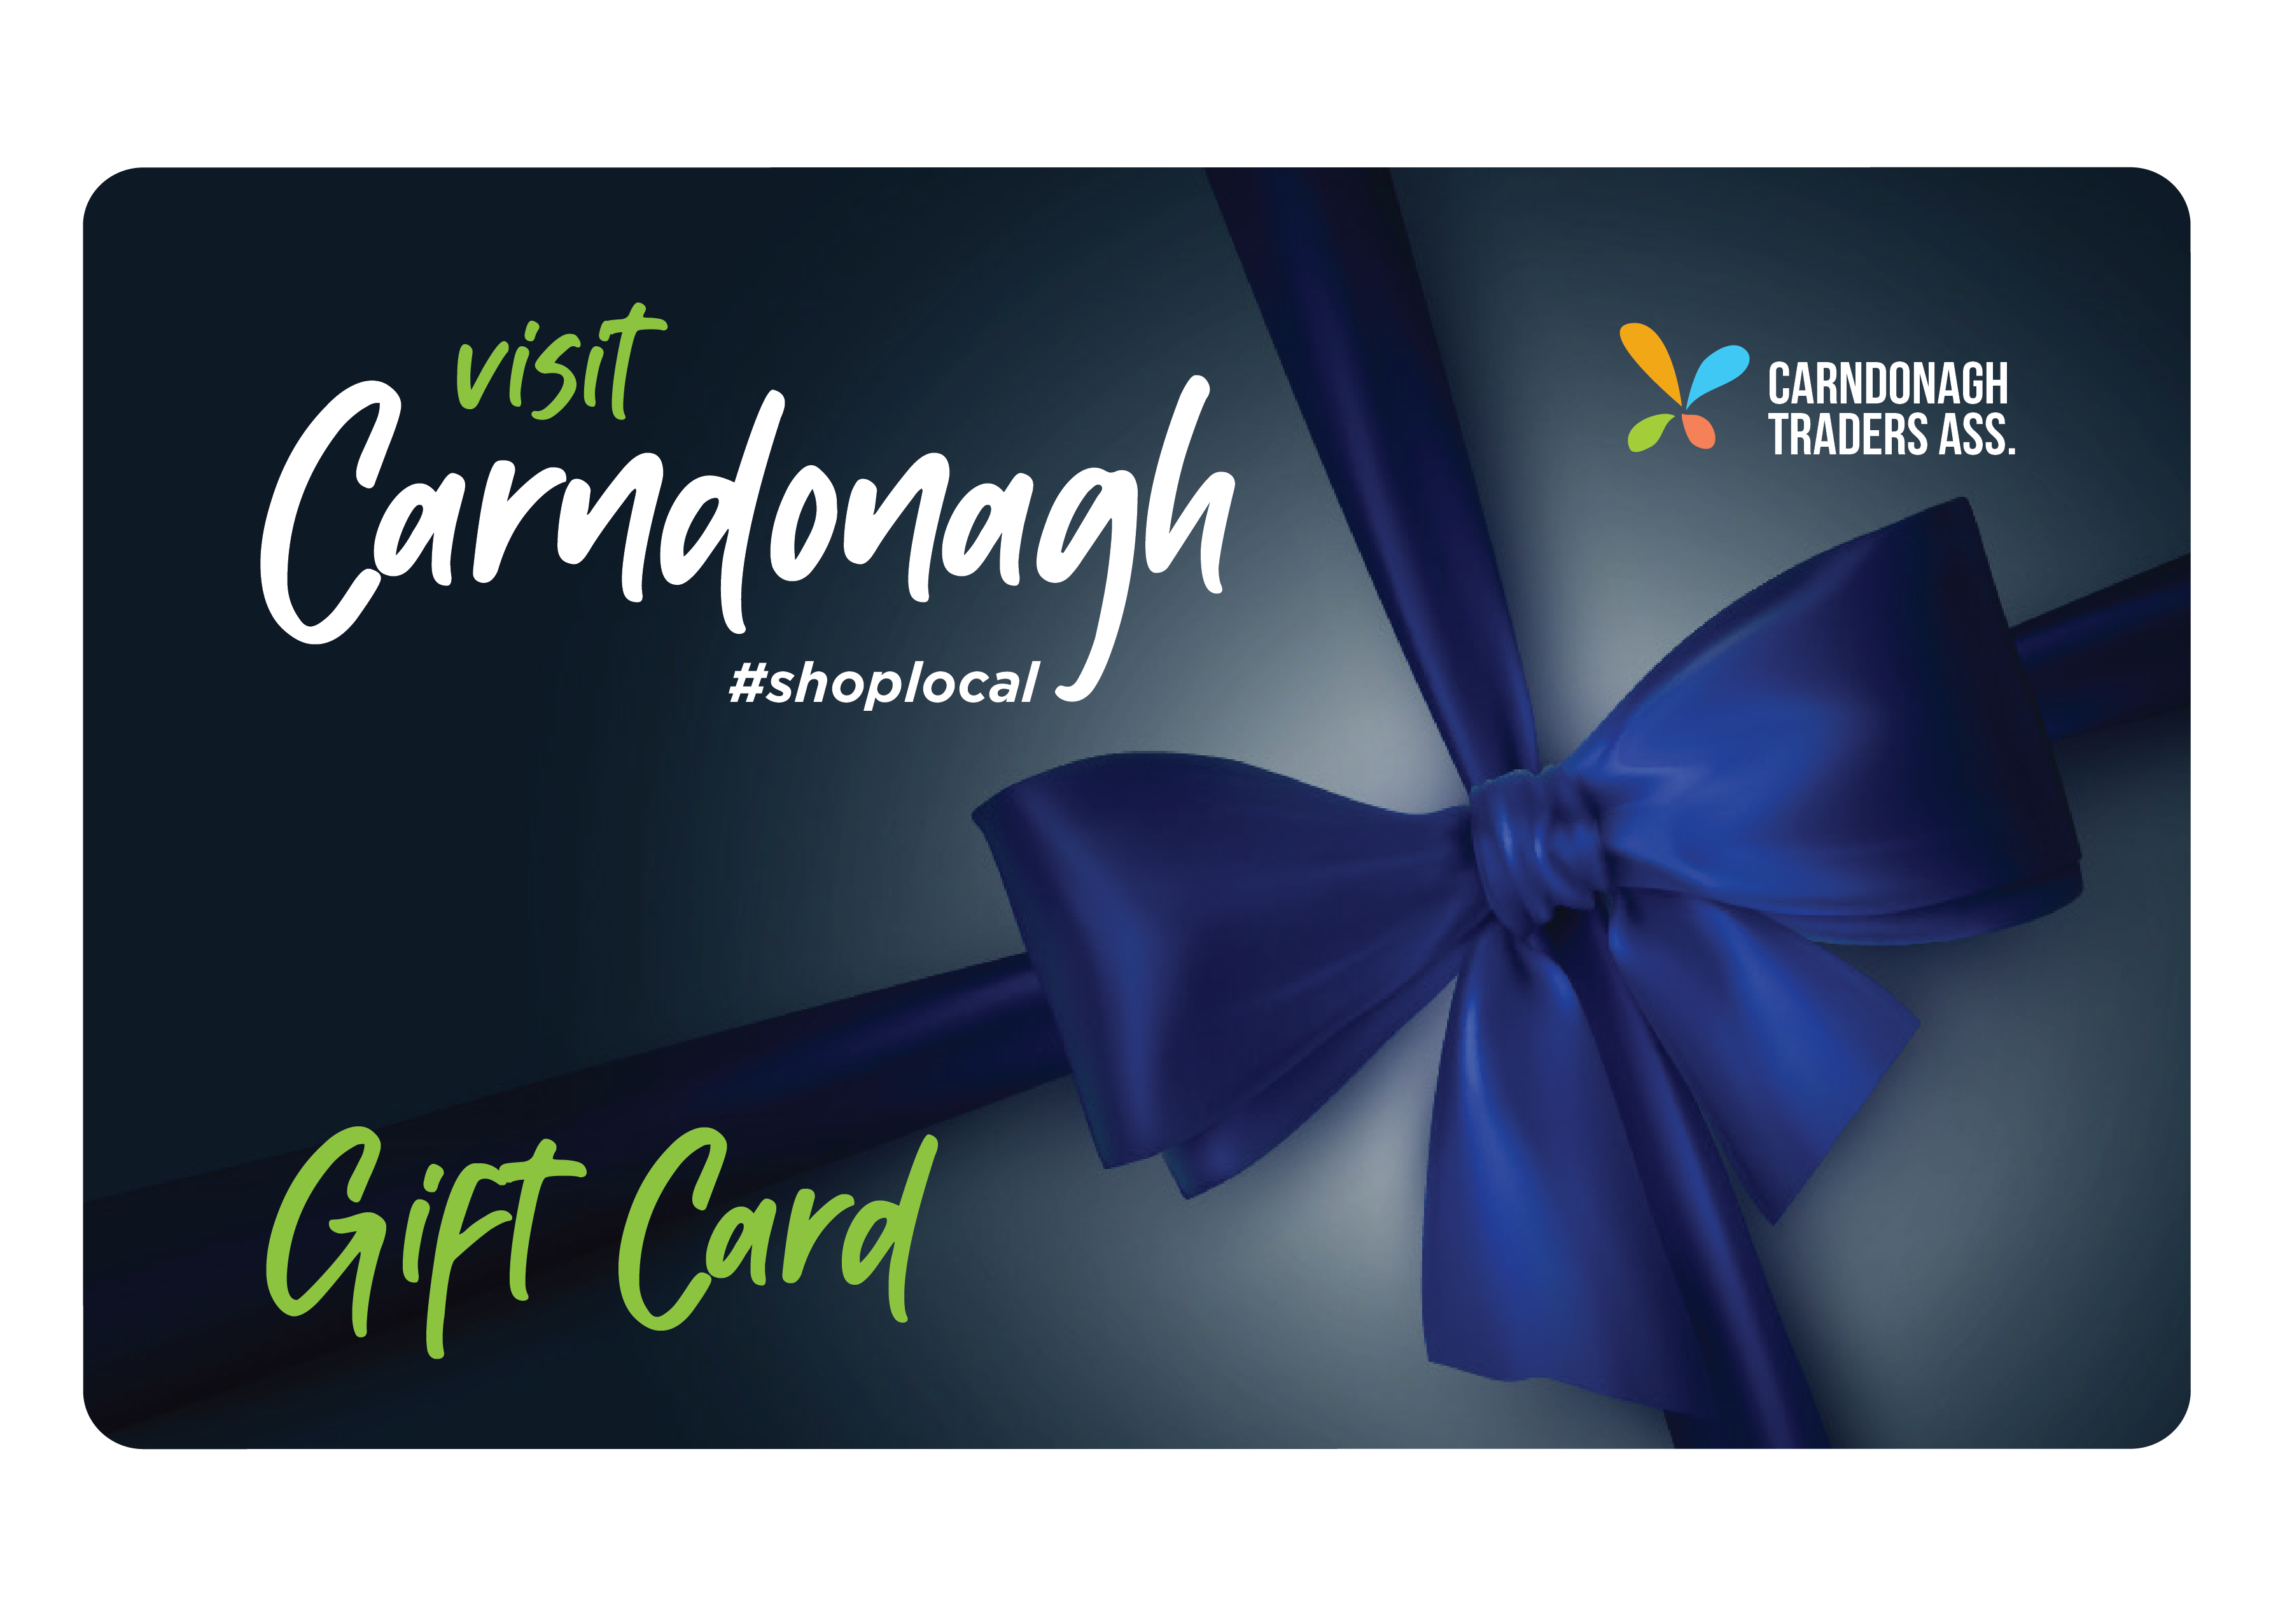 Visit Carndonagh Gift Card